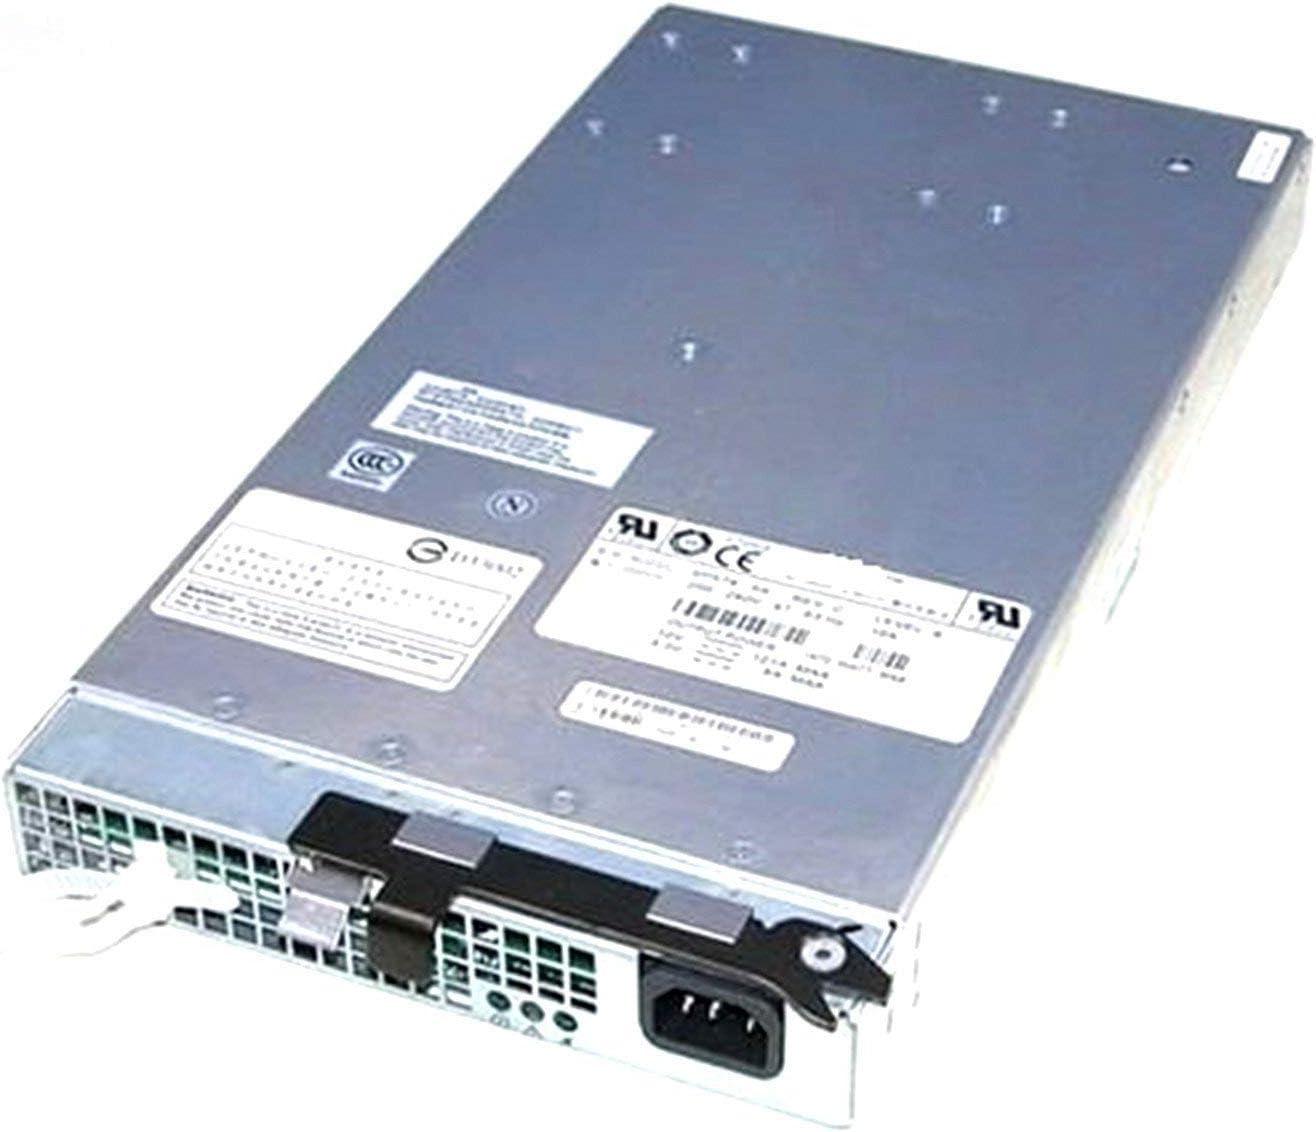 1470 Watt Redundant Power Supply for PowerEdge 6850 . SP574-5a Renewed Dell